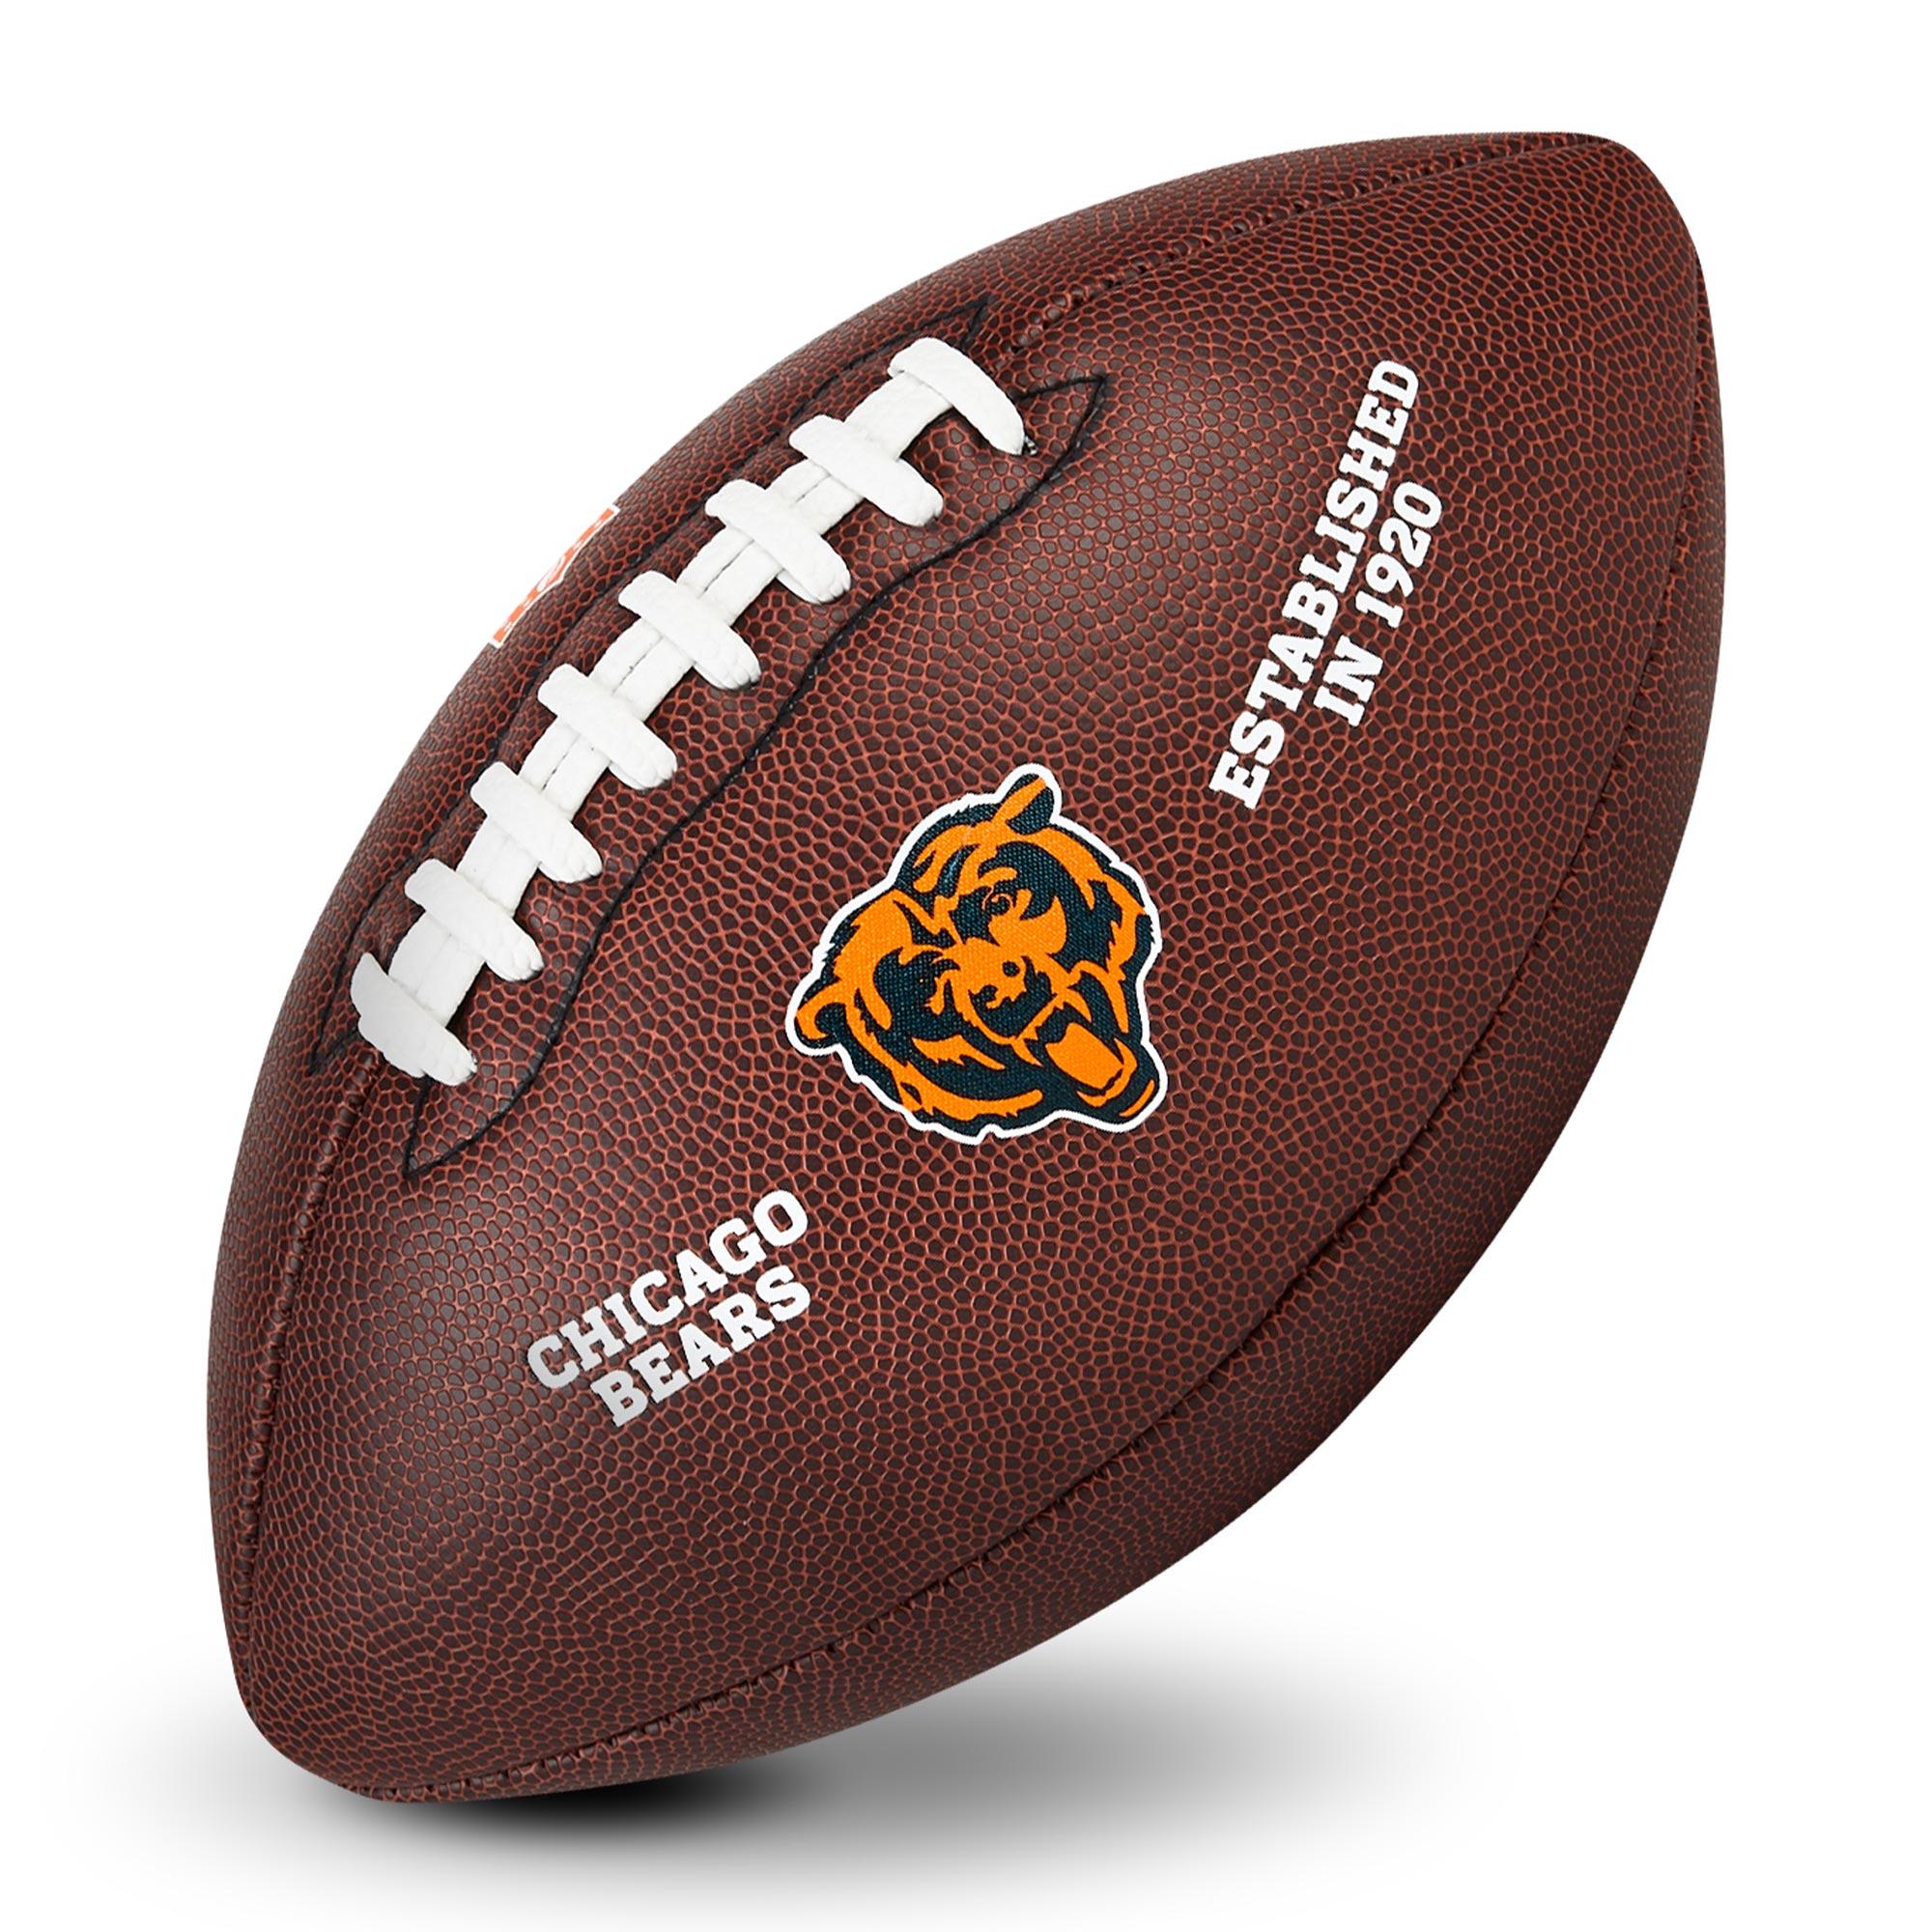 Chicago Bears Football mit Logo